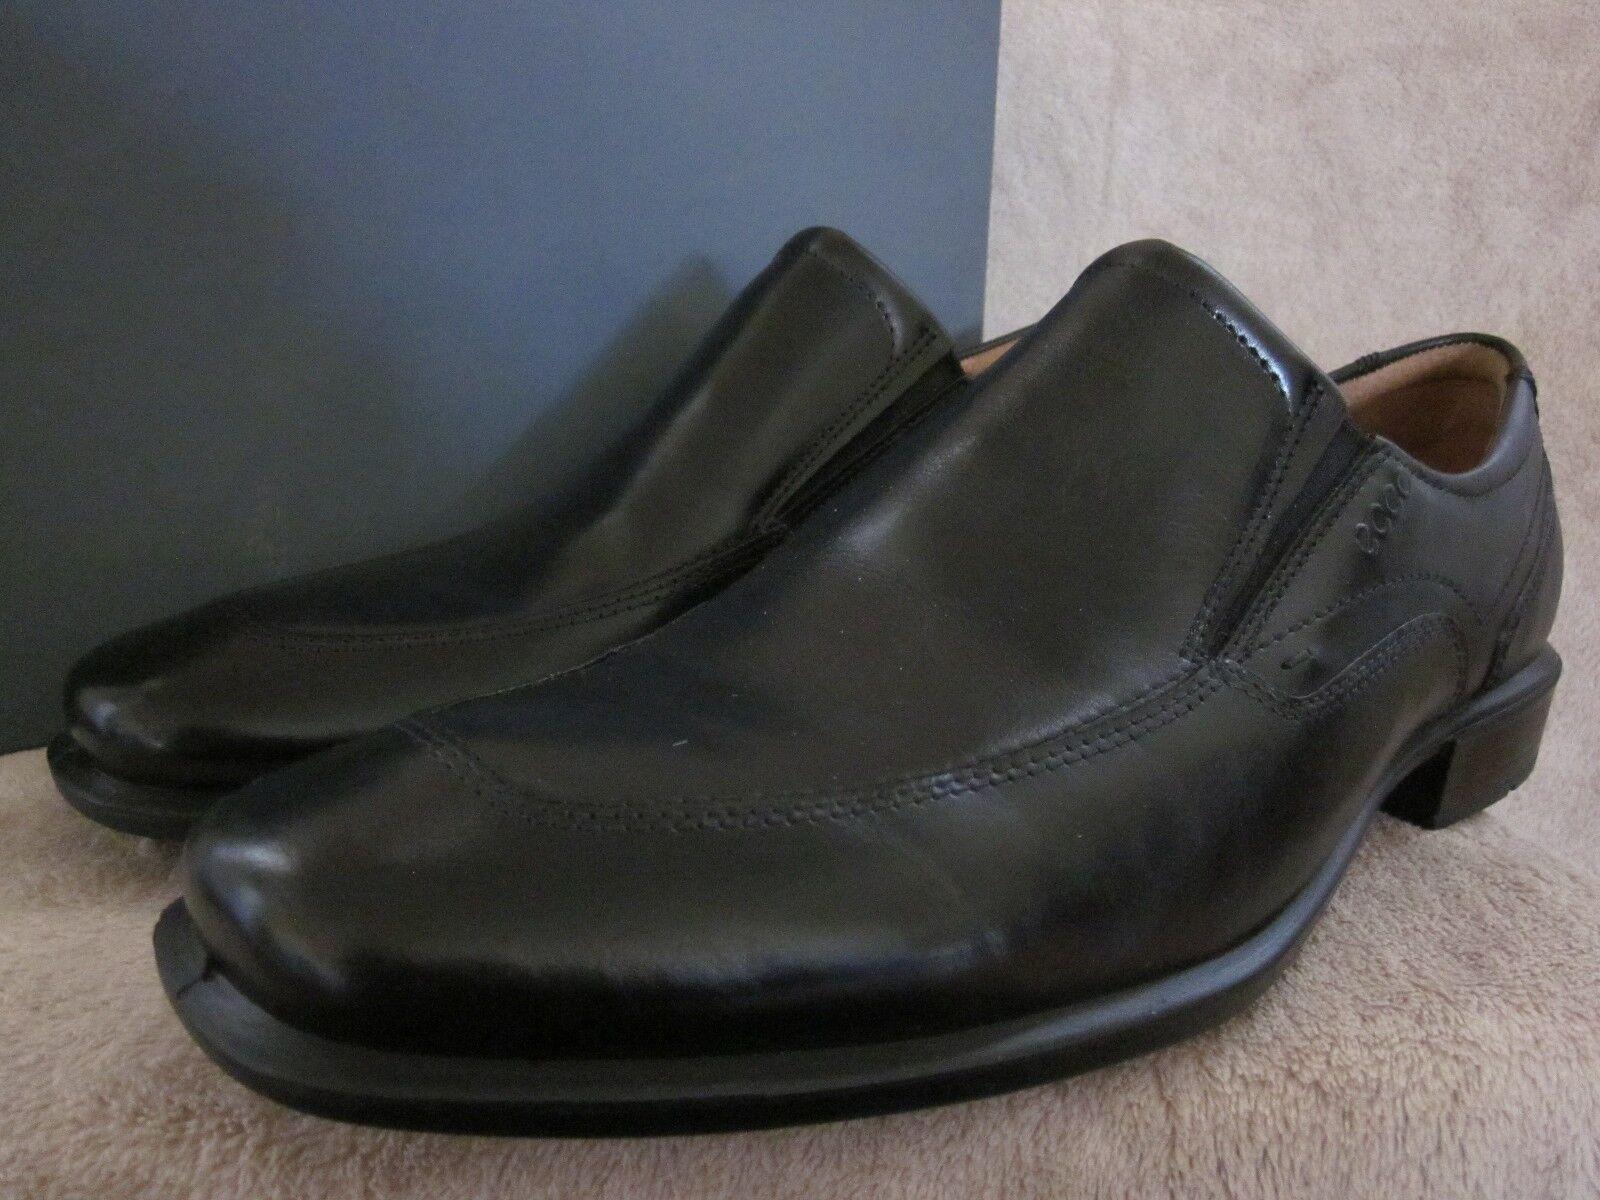 ECCO Mens Cairo Cairo Cairo Slip-on nero Leather Low Cut scarpe US 10 - 10.5 M EU 44 NWB 44052f